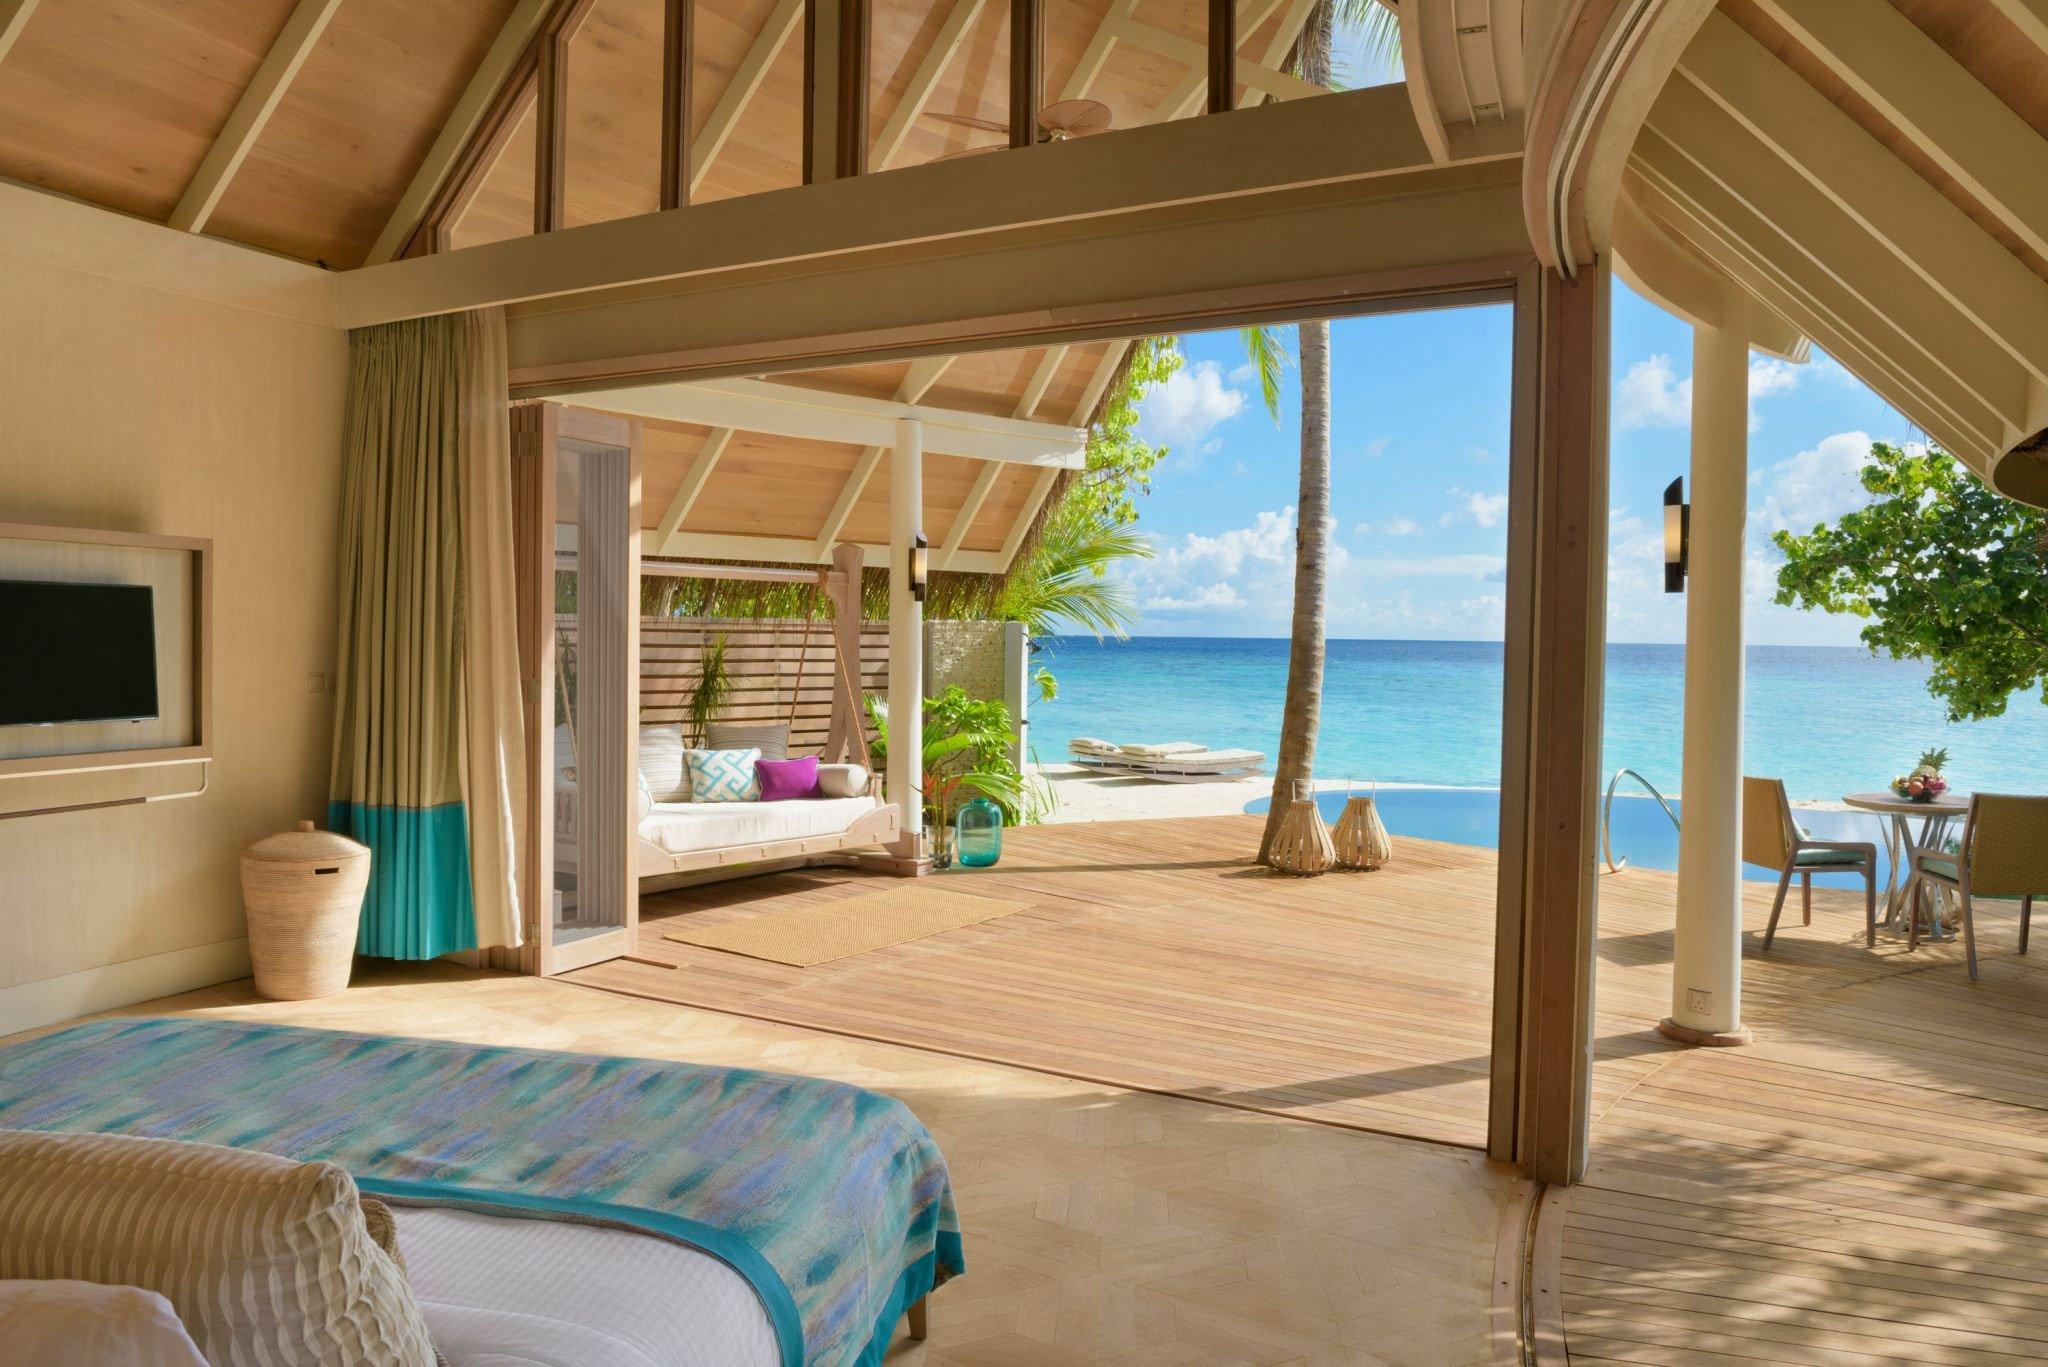 Luxuryretail_Maldives-Resort-to-Open-Among-UNESCO-Biosphere-Reserve-suite